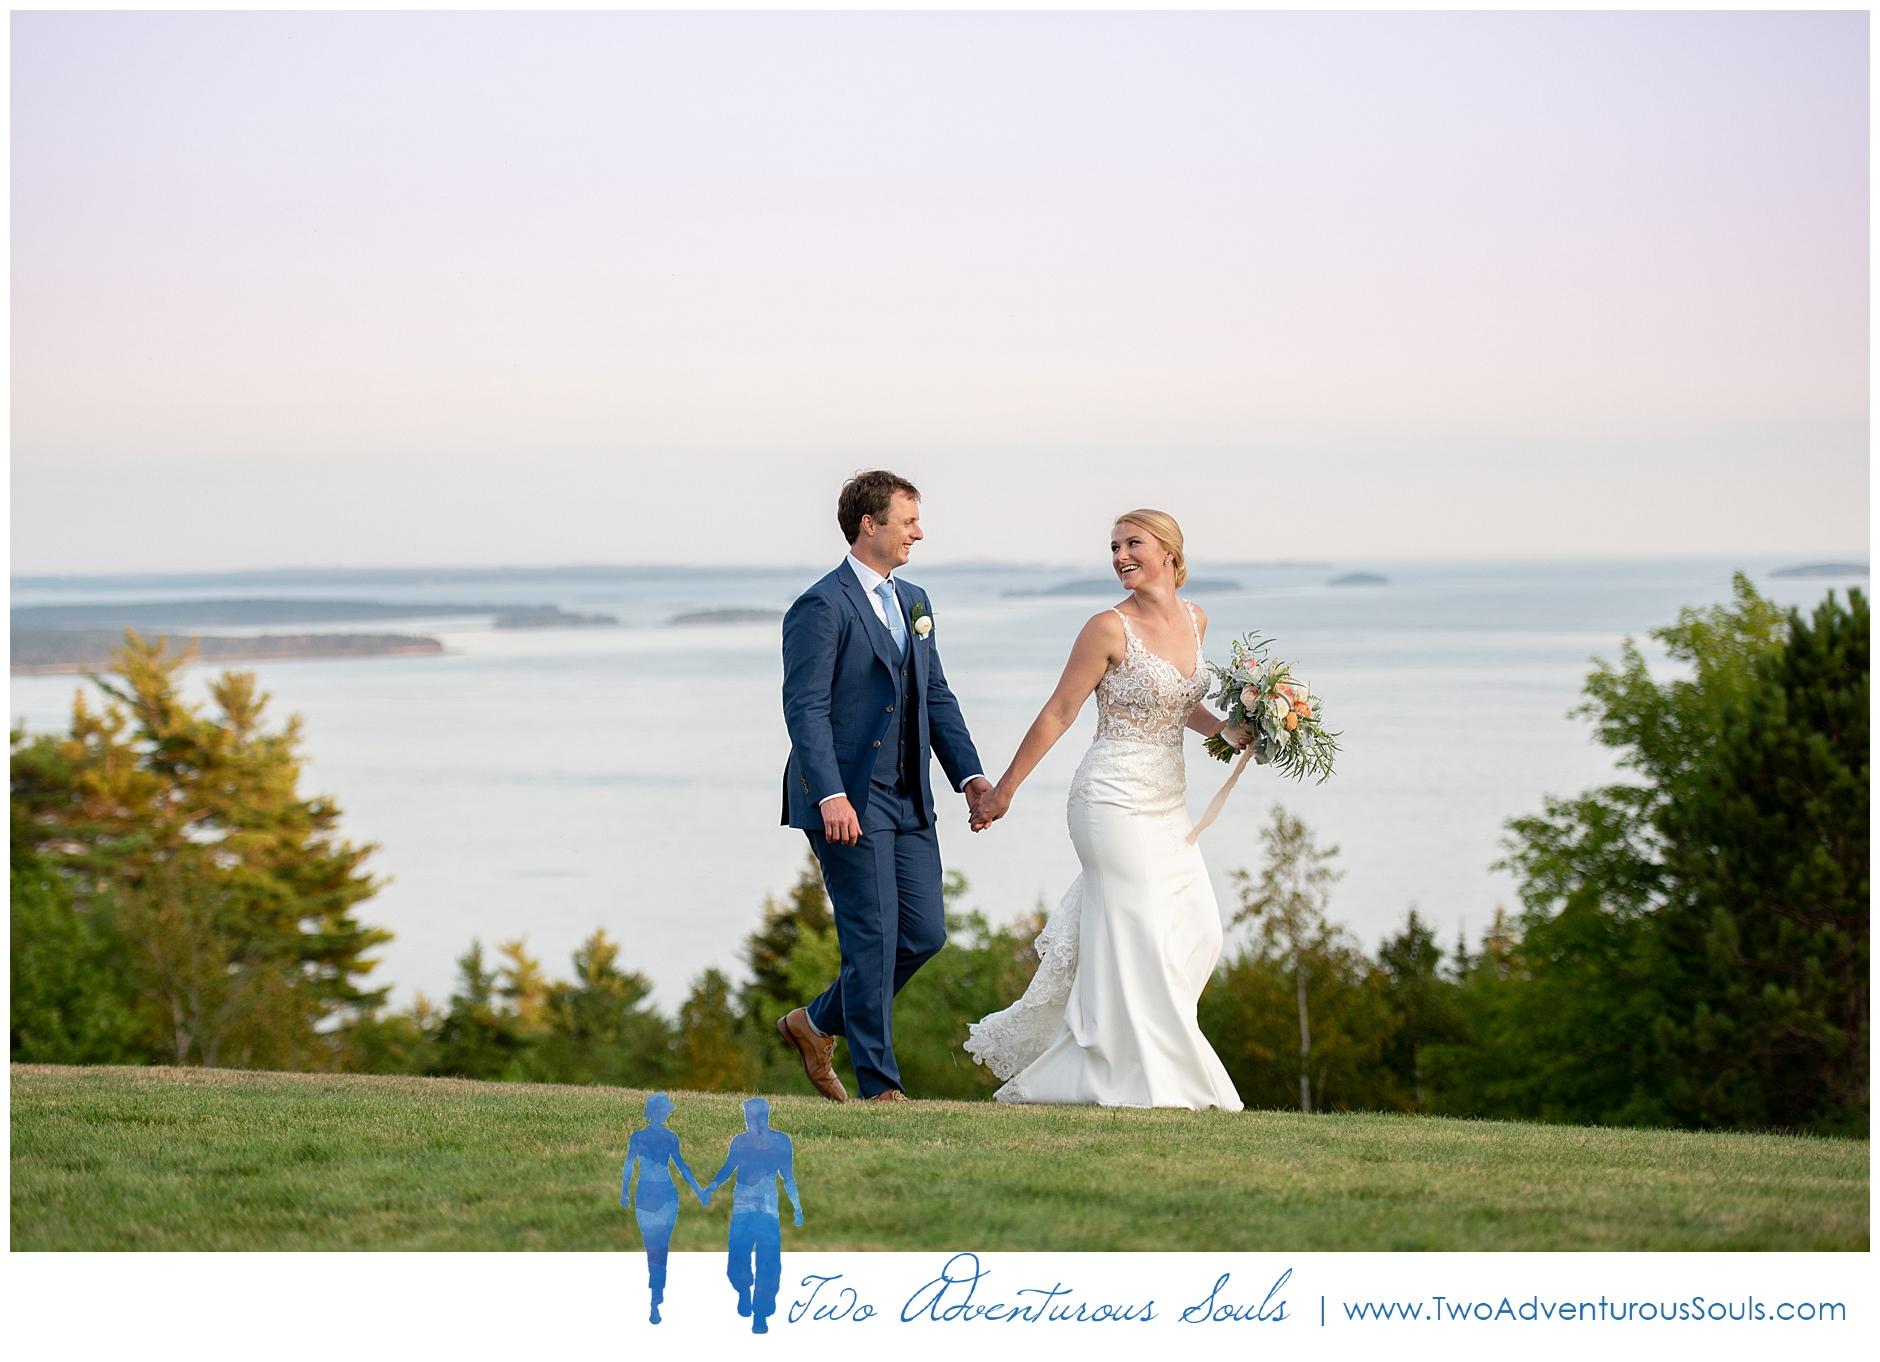 Maine Wedding Photographers, Point Lookout Wedding Photographers, Maine Elopement Photographers, Two Adventurous Souls-0080419_0058.jpg